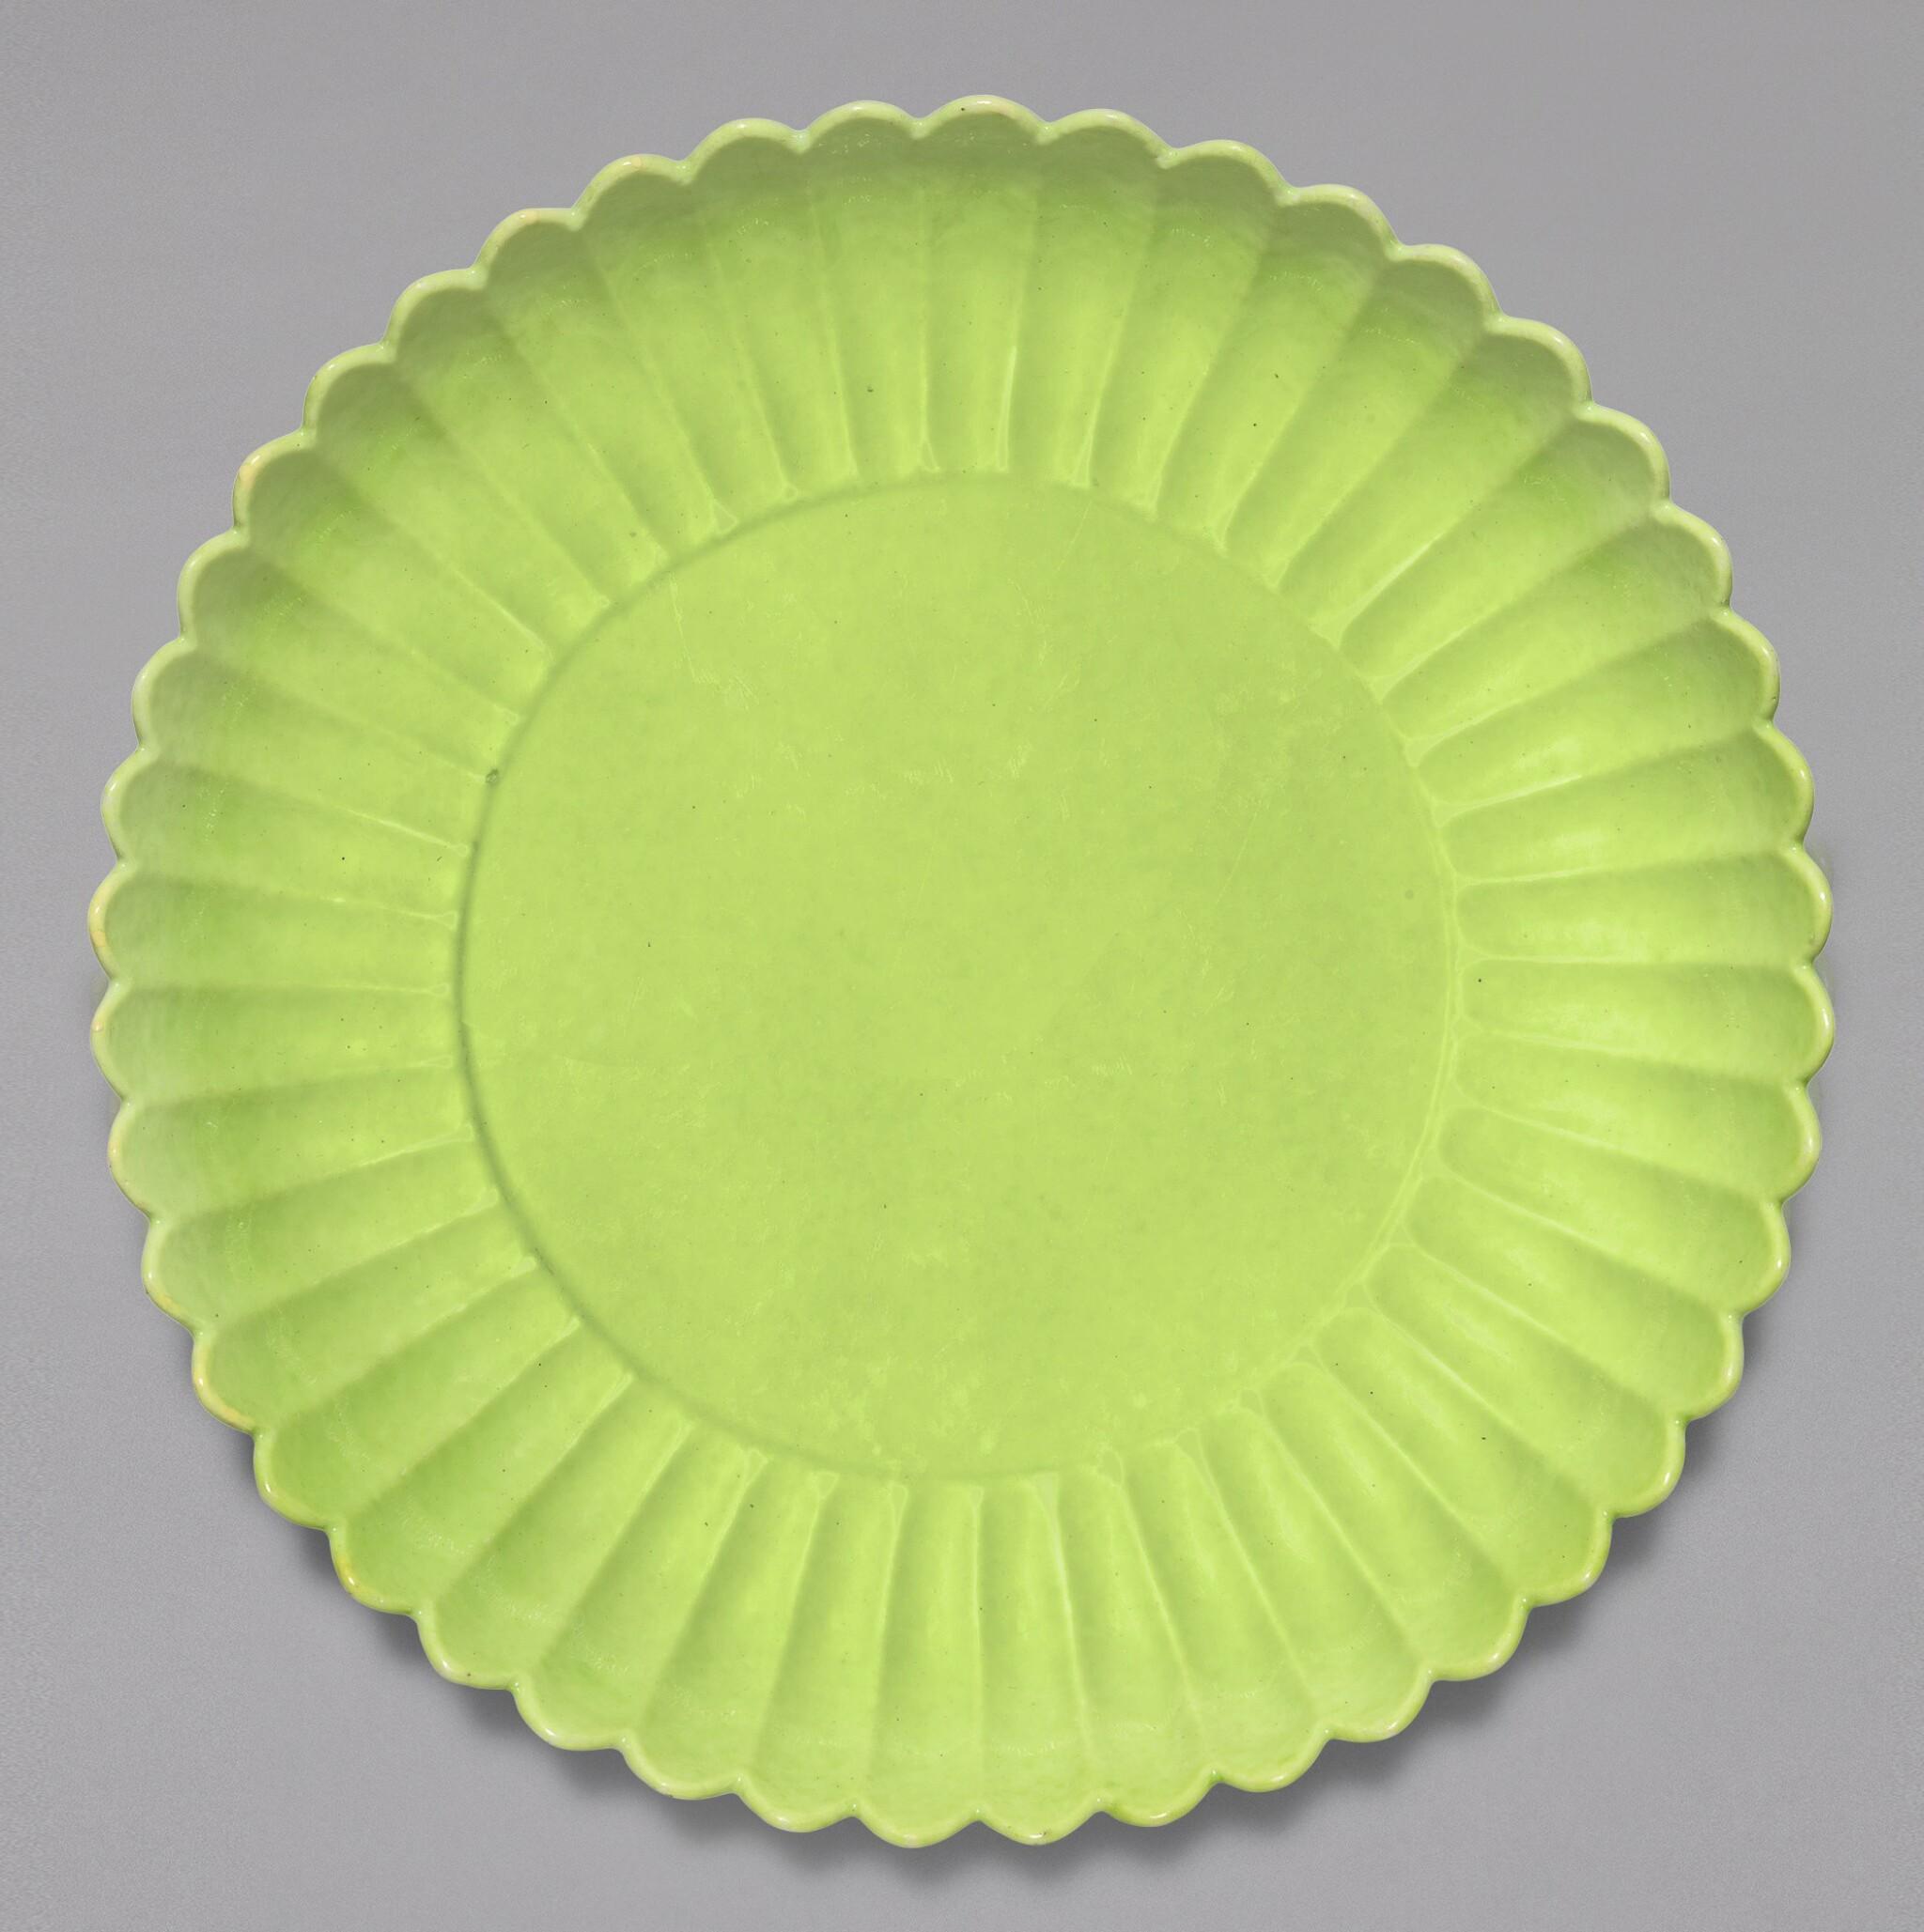 View full screen - View 1 of Lot 6. A RARE LIME GREEN-ENAMELLED 'CHRYSANTHEMUM' DISH, YONGZHENG MARK AND PERIOD | 清雍正 青綠釉菊瓣盤 《大清雍正年製》款.